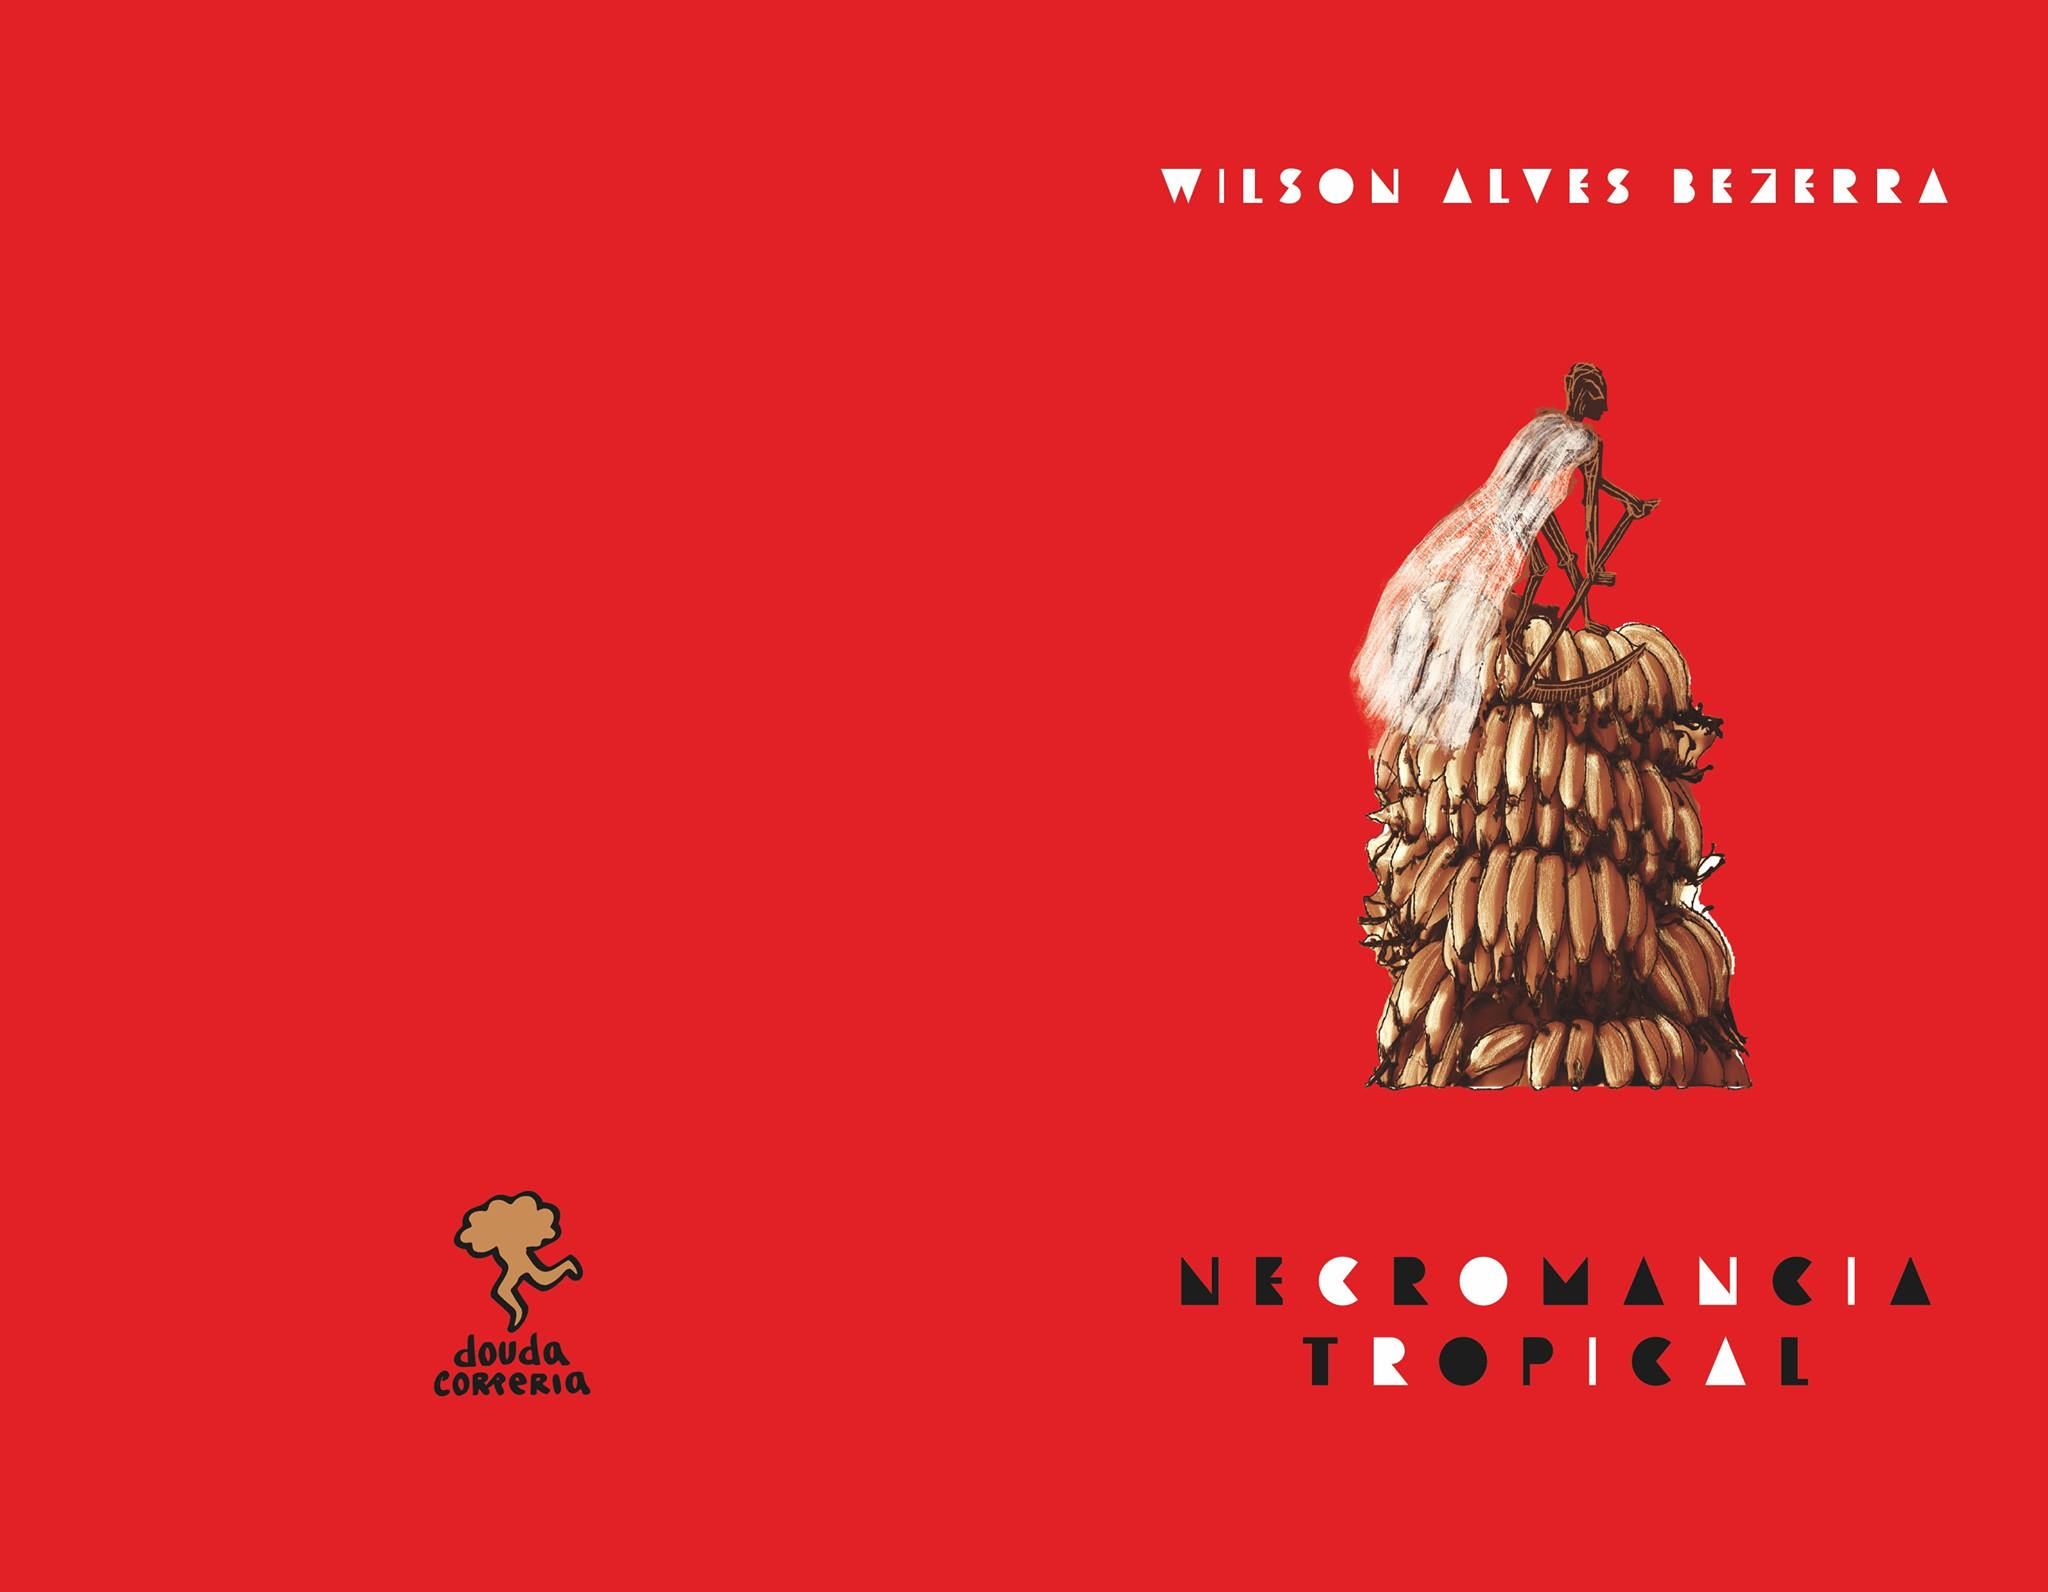 Lançamento: Necromancia Tropical – Wilson Alves Bezerra